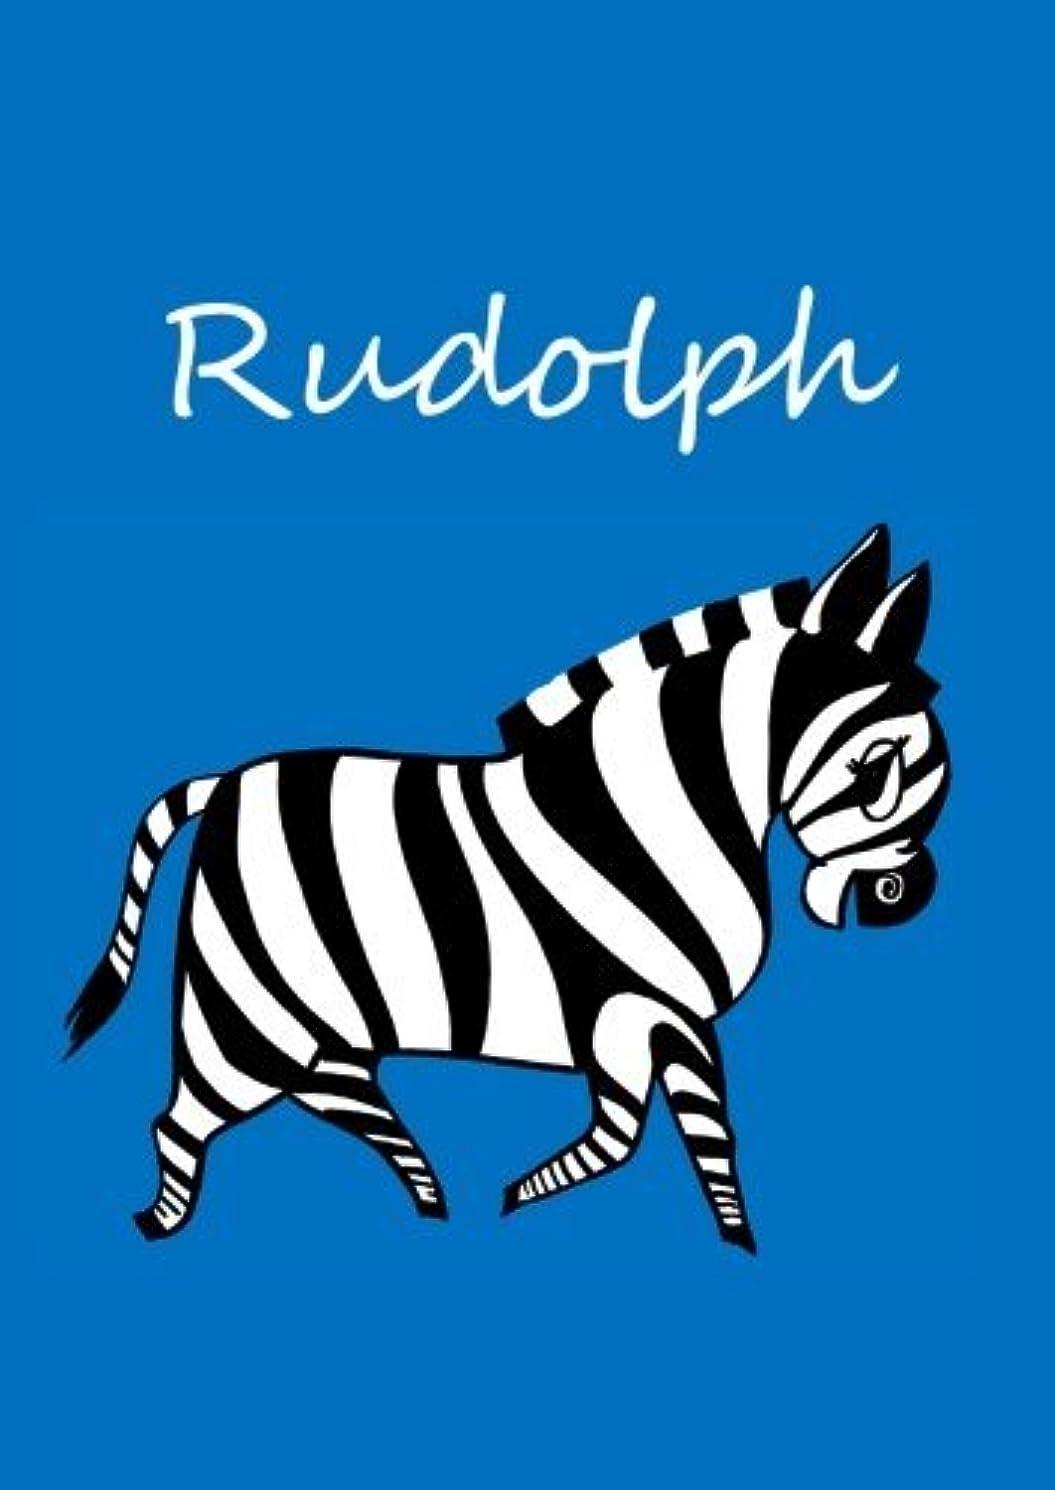 ボクシング製造懐疑論Rudolph: individualisiertes Malbuch / Notizbuch / Tagebuch - Zebra - A4 - blanko